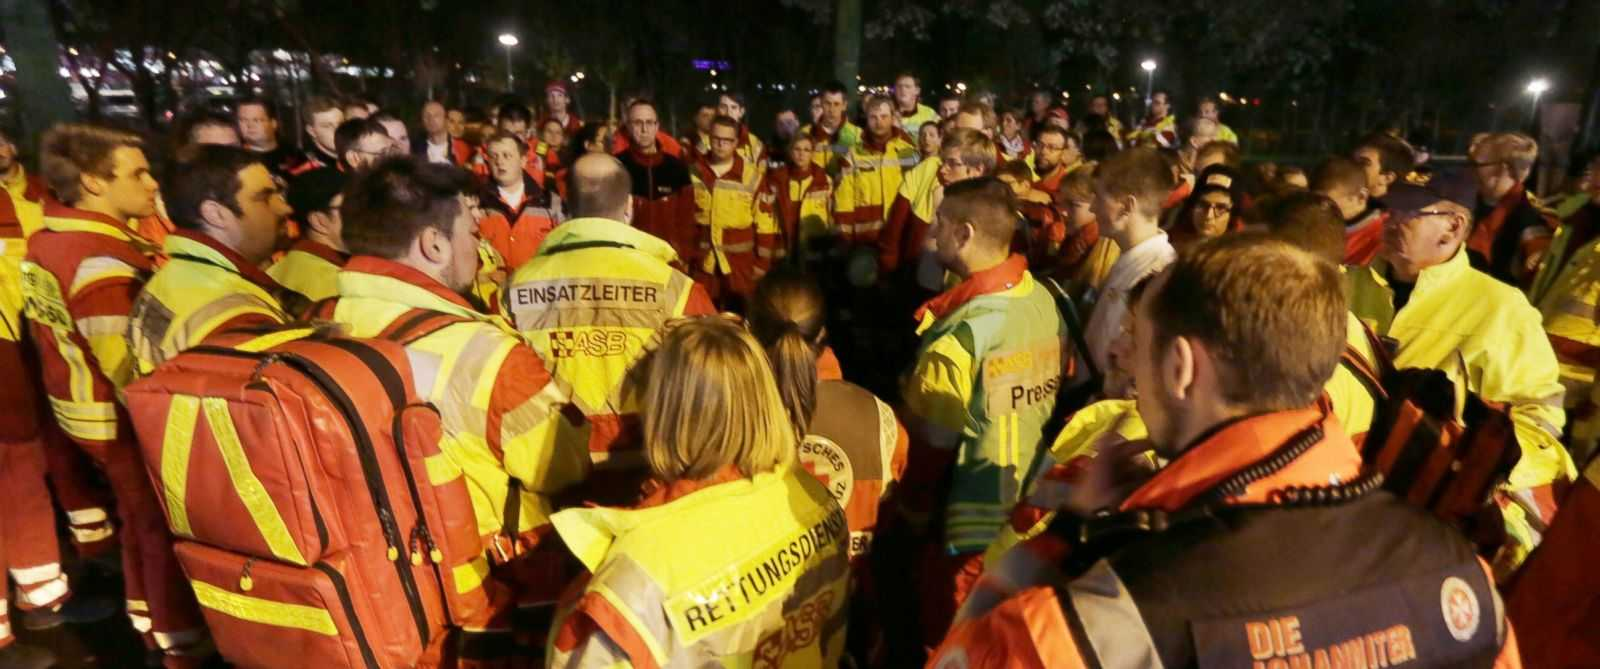 "FALSA ALERTA TERORISTA LA HANOVRA. Anularea meciului dintre Germania-Olanda si evacuarea cancelarului MERKEL, dar si o PSIHOZA alimentata de PRESA GERMANA: <i>""ambulanta plina de explozibili""</i>"